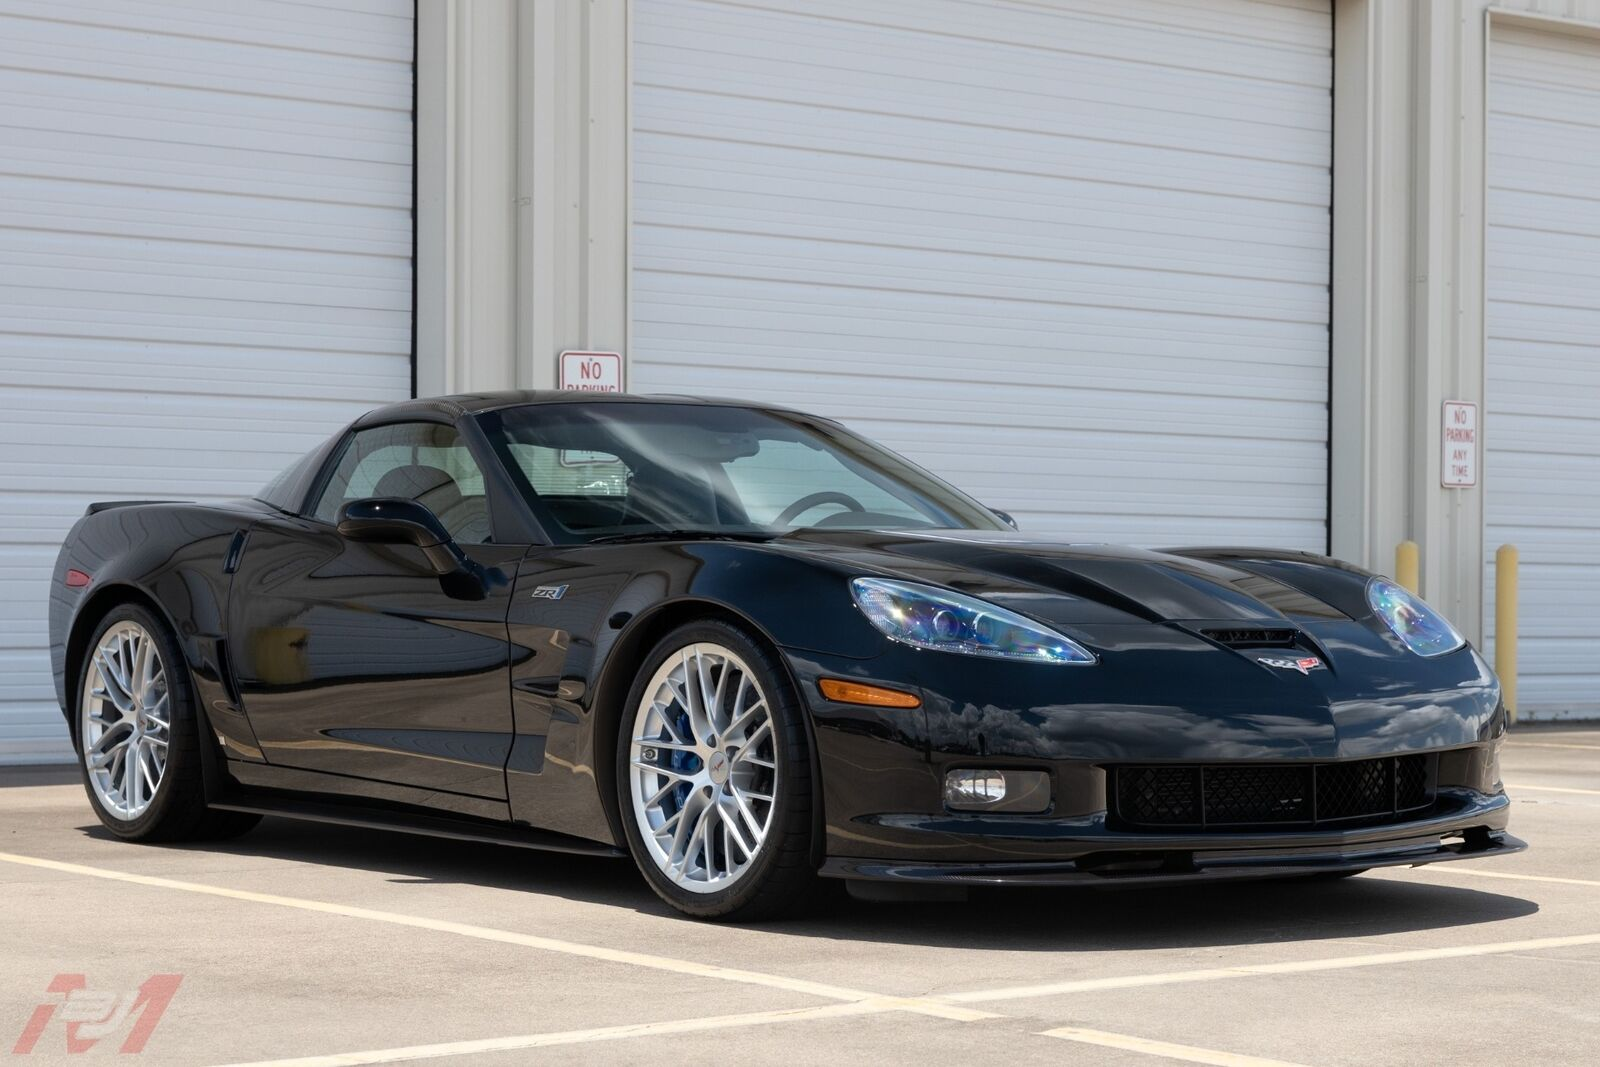 2009 Black Chevrolet Corvette ZR1    C6 Corvette Photo 5